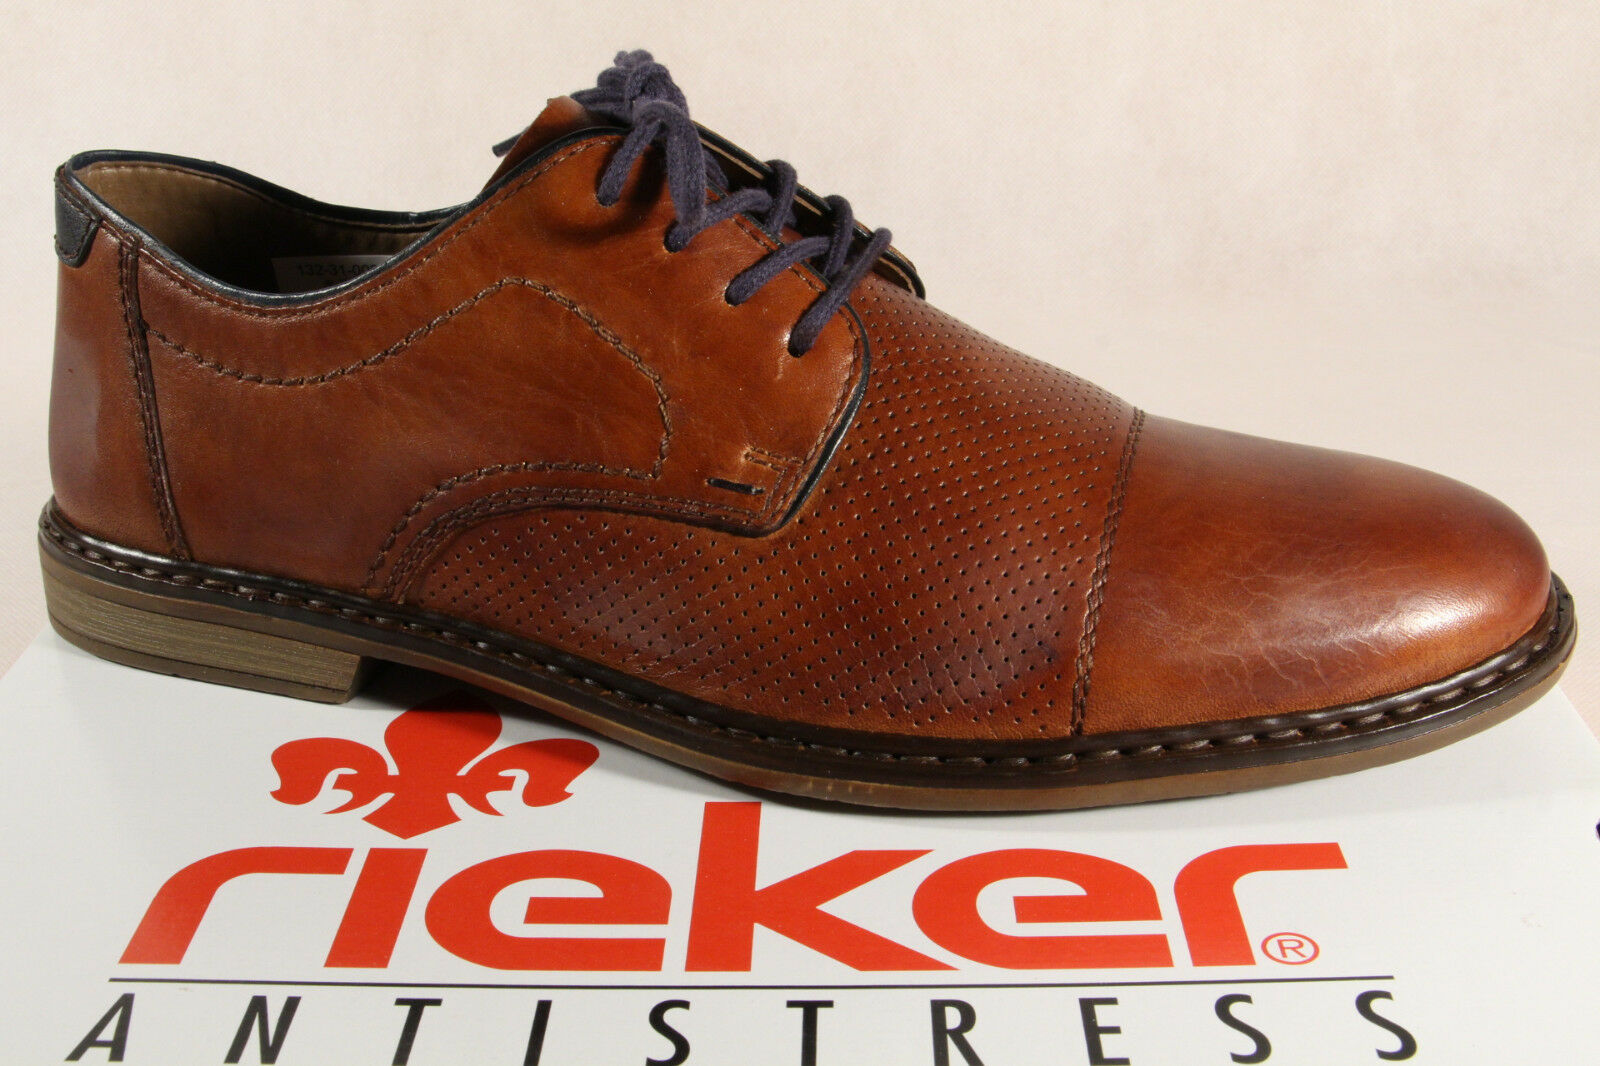 c94ca251b962 Rieker Herren Schnürschuhe, Halbschuhe Sneakers braun Leder 13428 NEU!